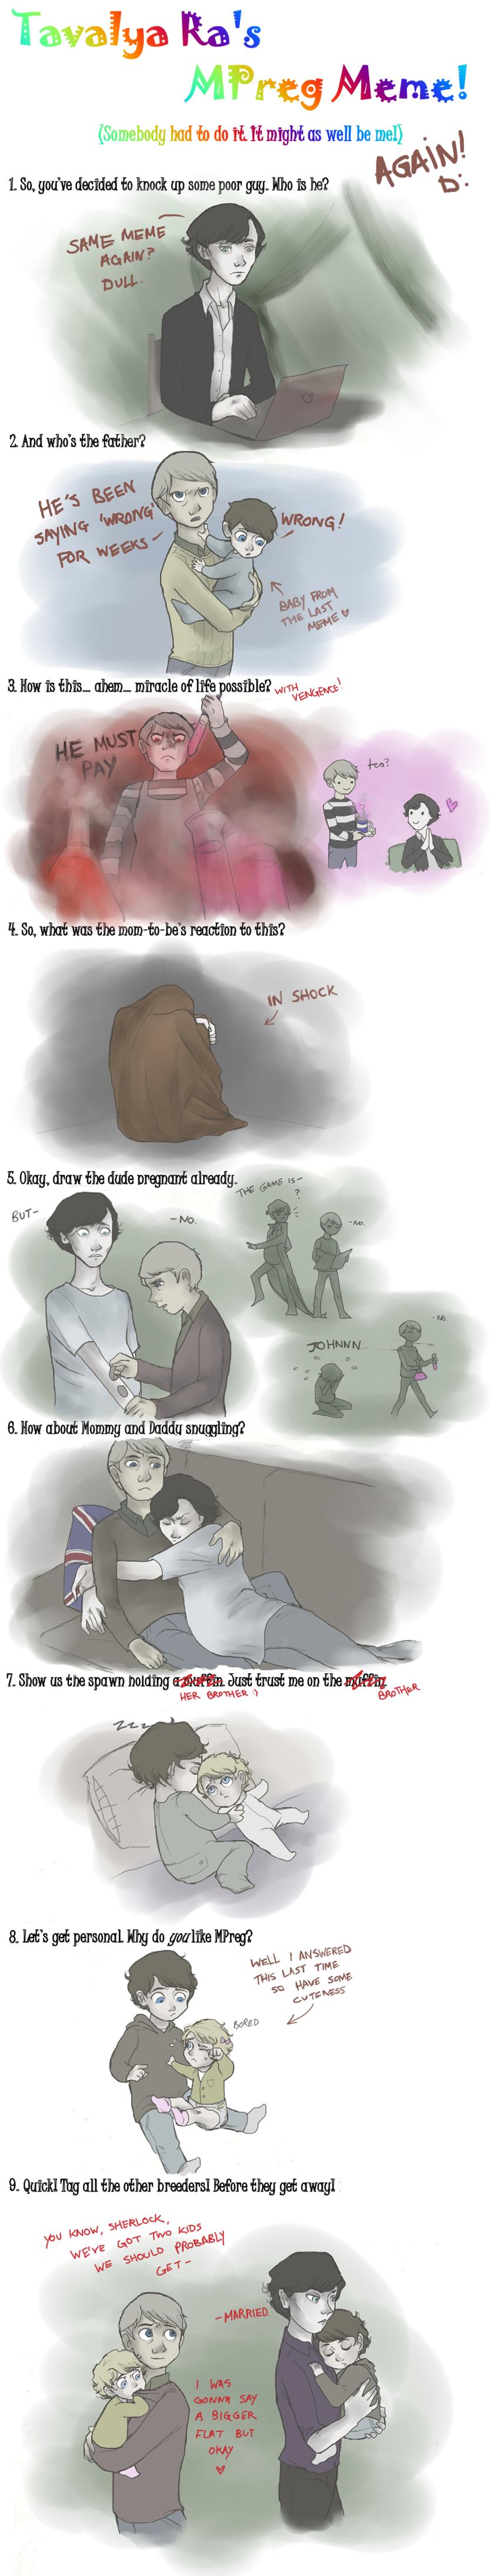 Sherlock Mpreg Meme - THE SEQUEL by wasitelves.deviantart.com on @deviantART